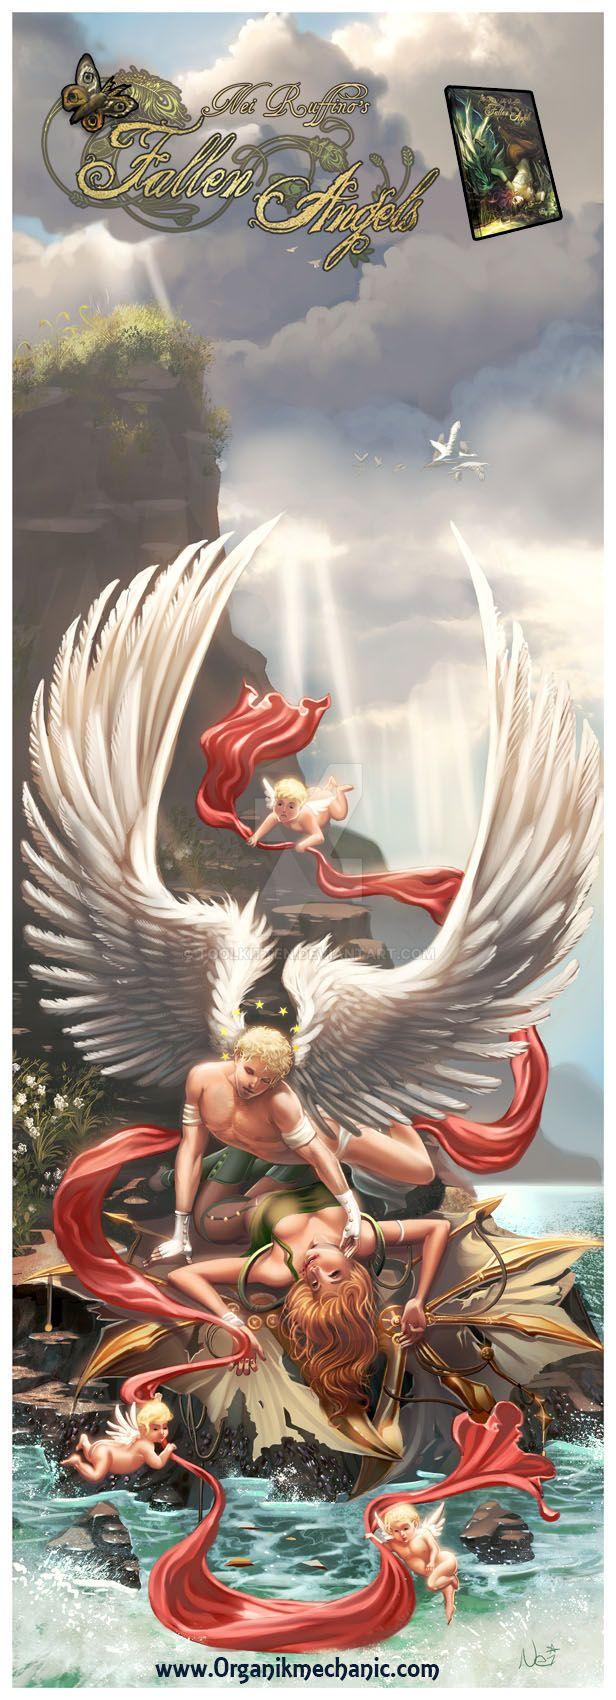 The Foolish fallen angel by ToolKitten